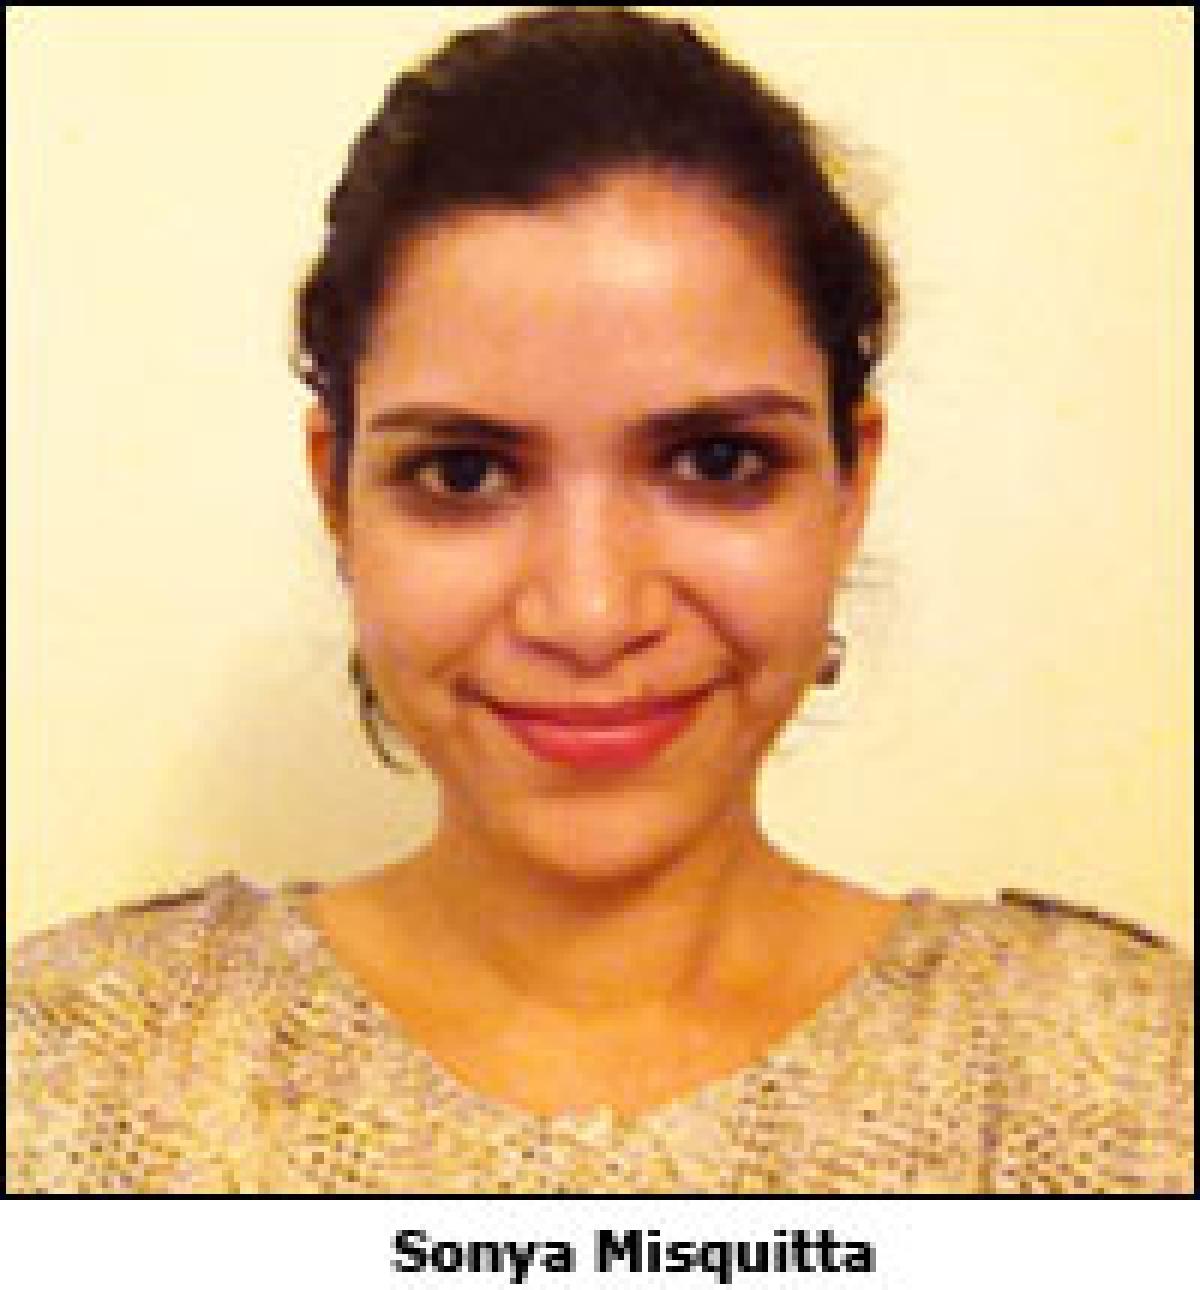 Grey's Dheeraj Sinha and Sonya Misquitta win at WPP Atticus Awards 2014